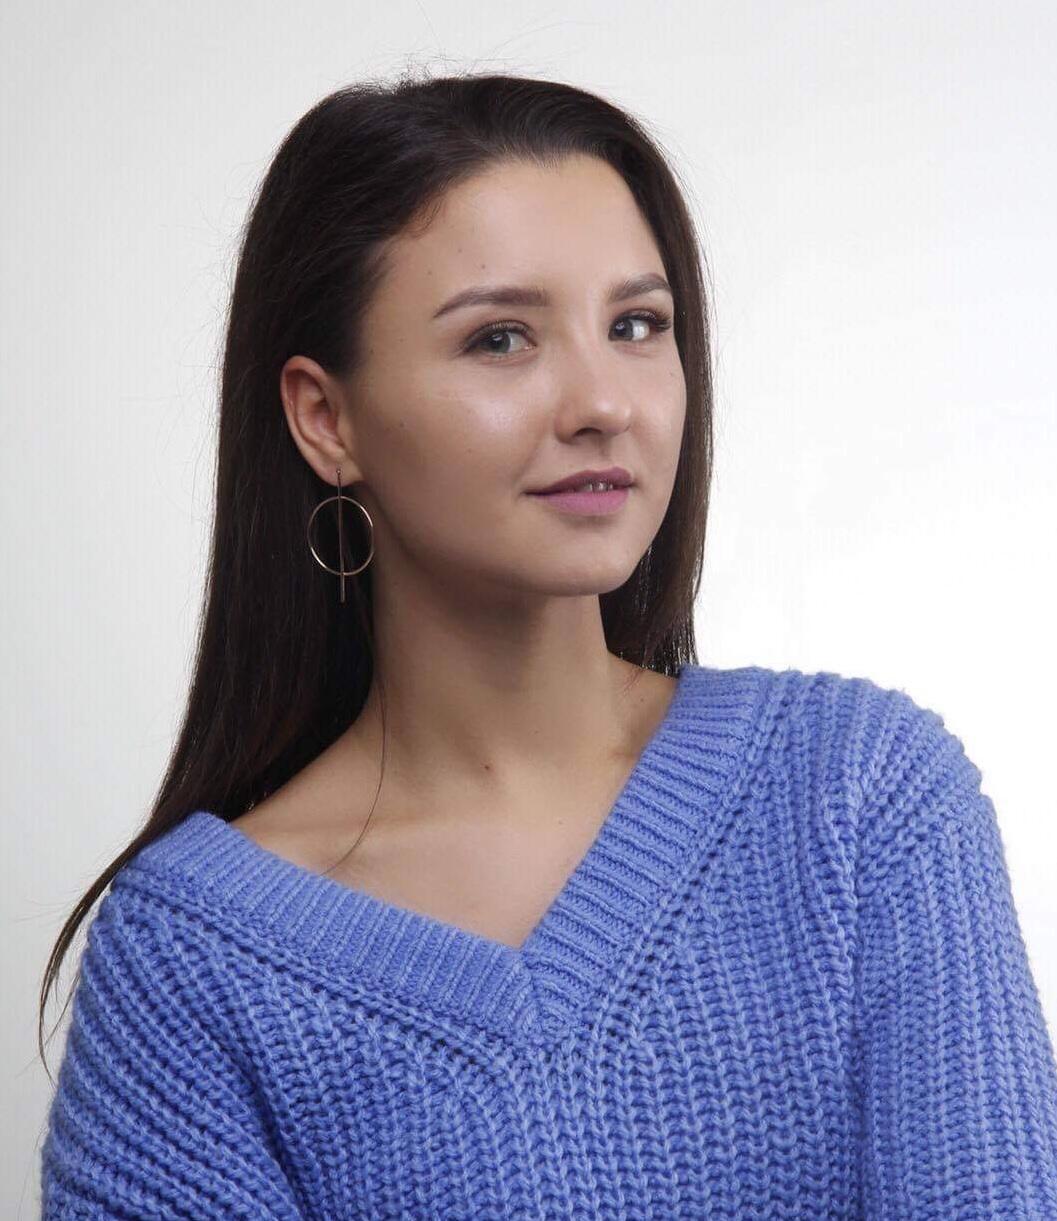 Martyna Kot